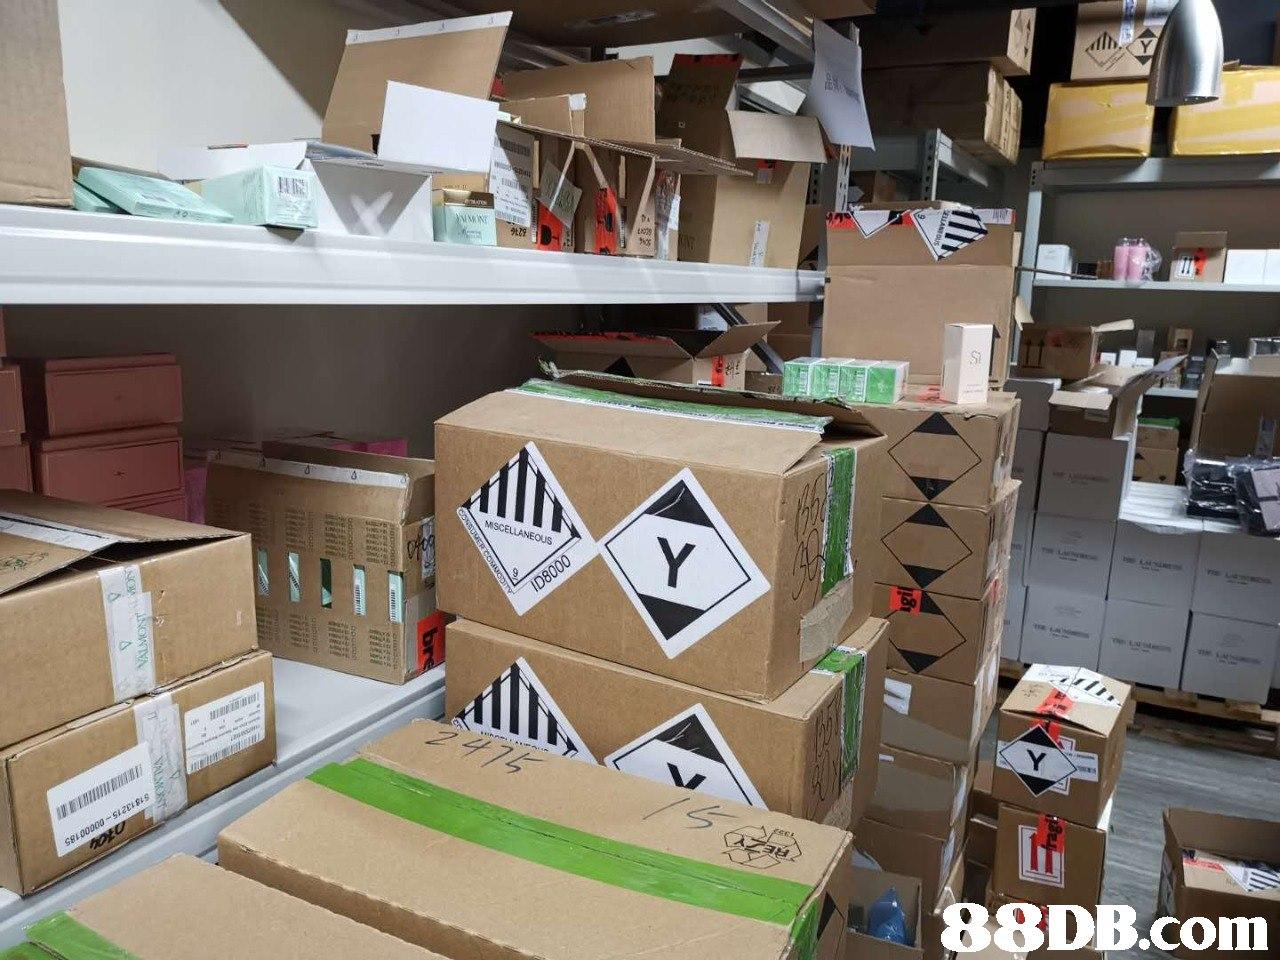 96% Si   Cardboard,Carton,Wood,Room,Paper product